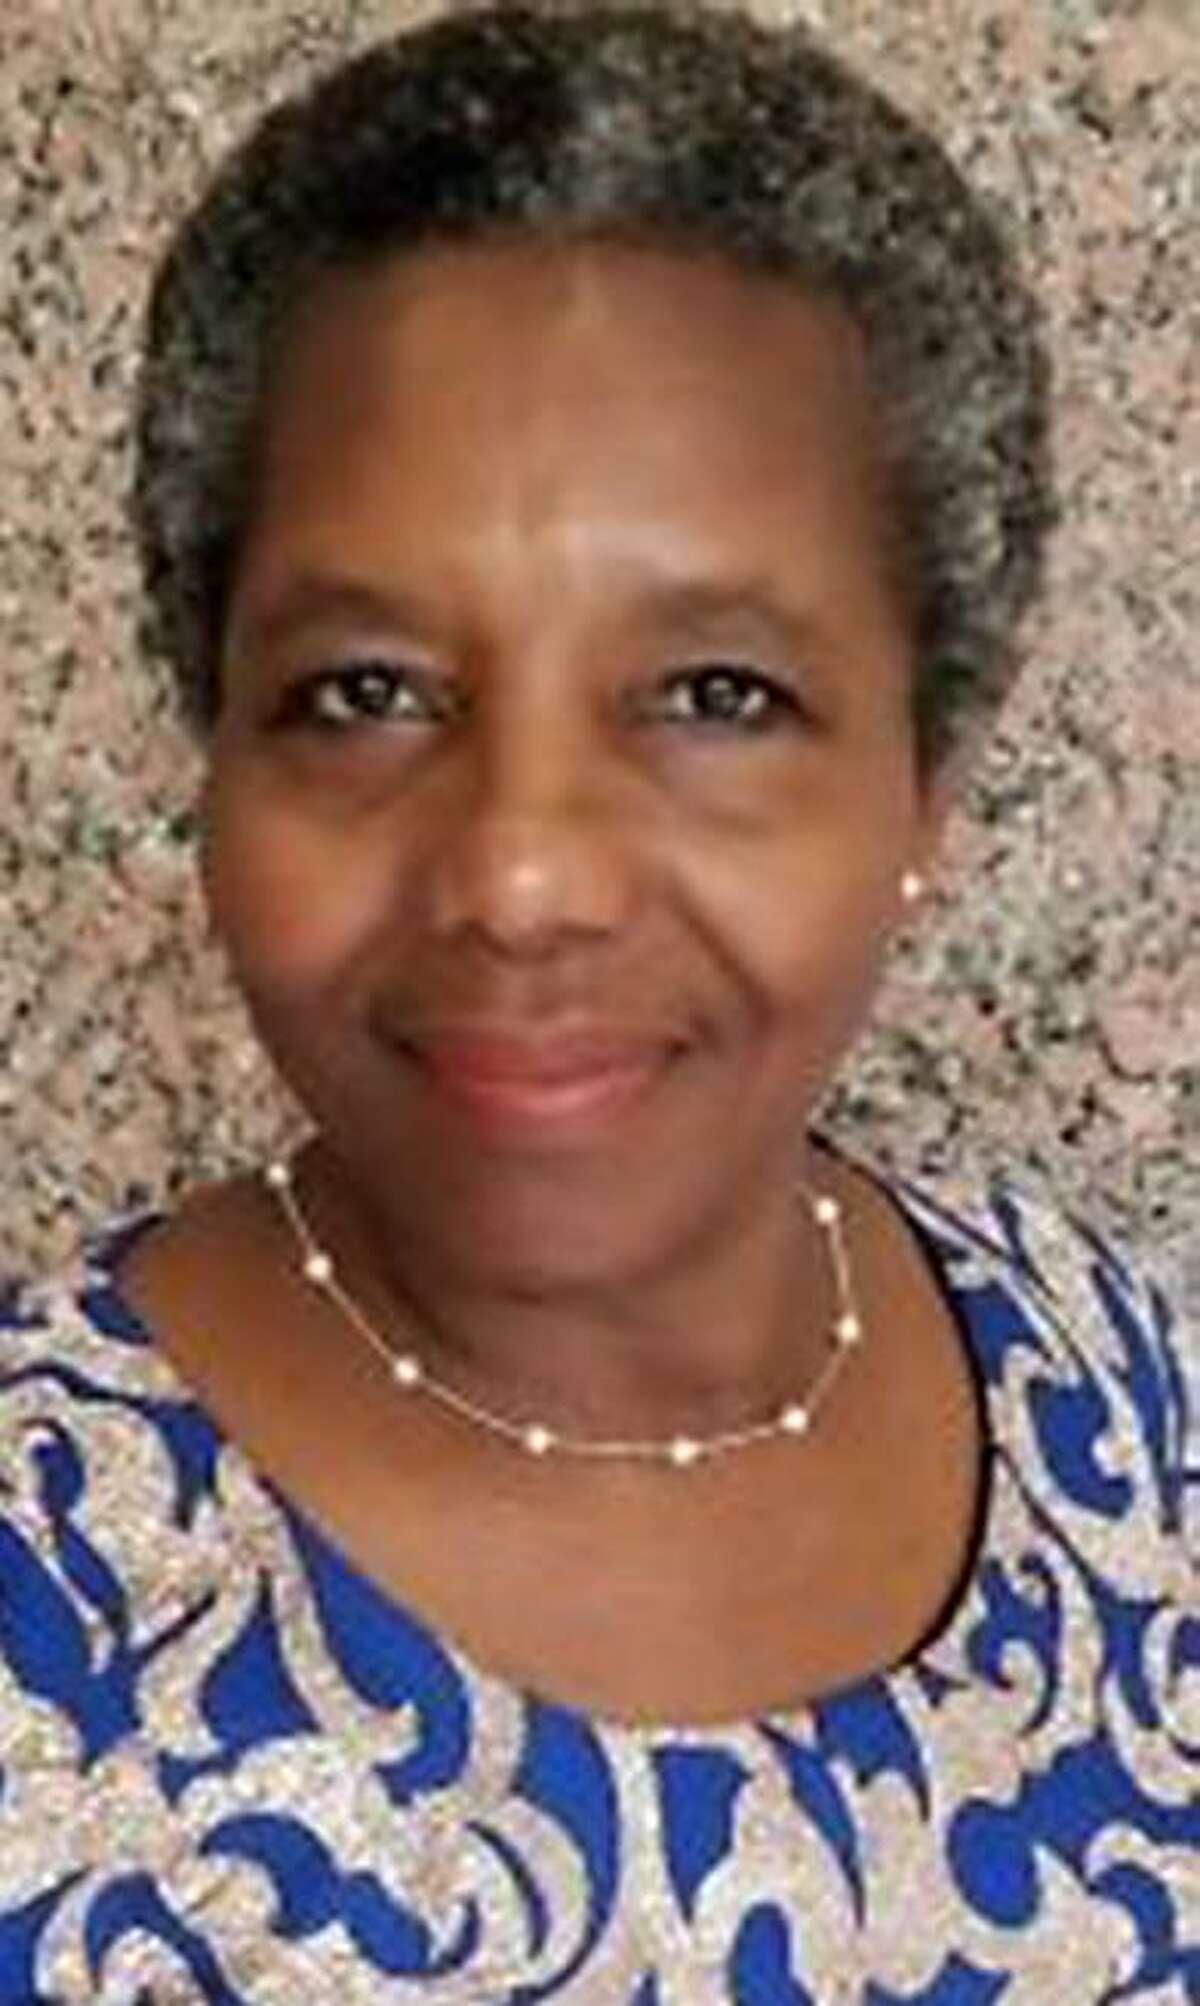 Judge Grace Uzomba, County Court-at-Law No. 2